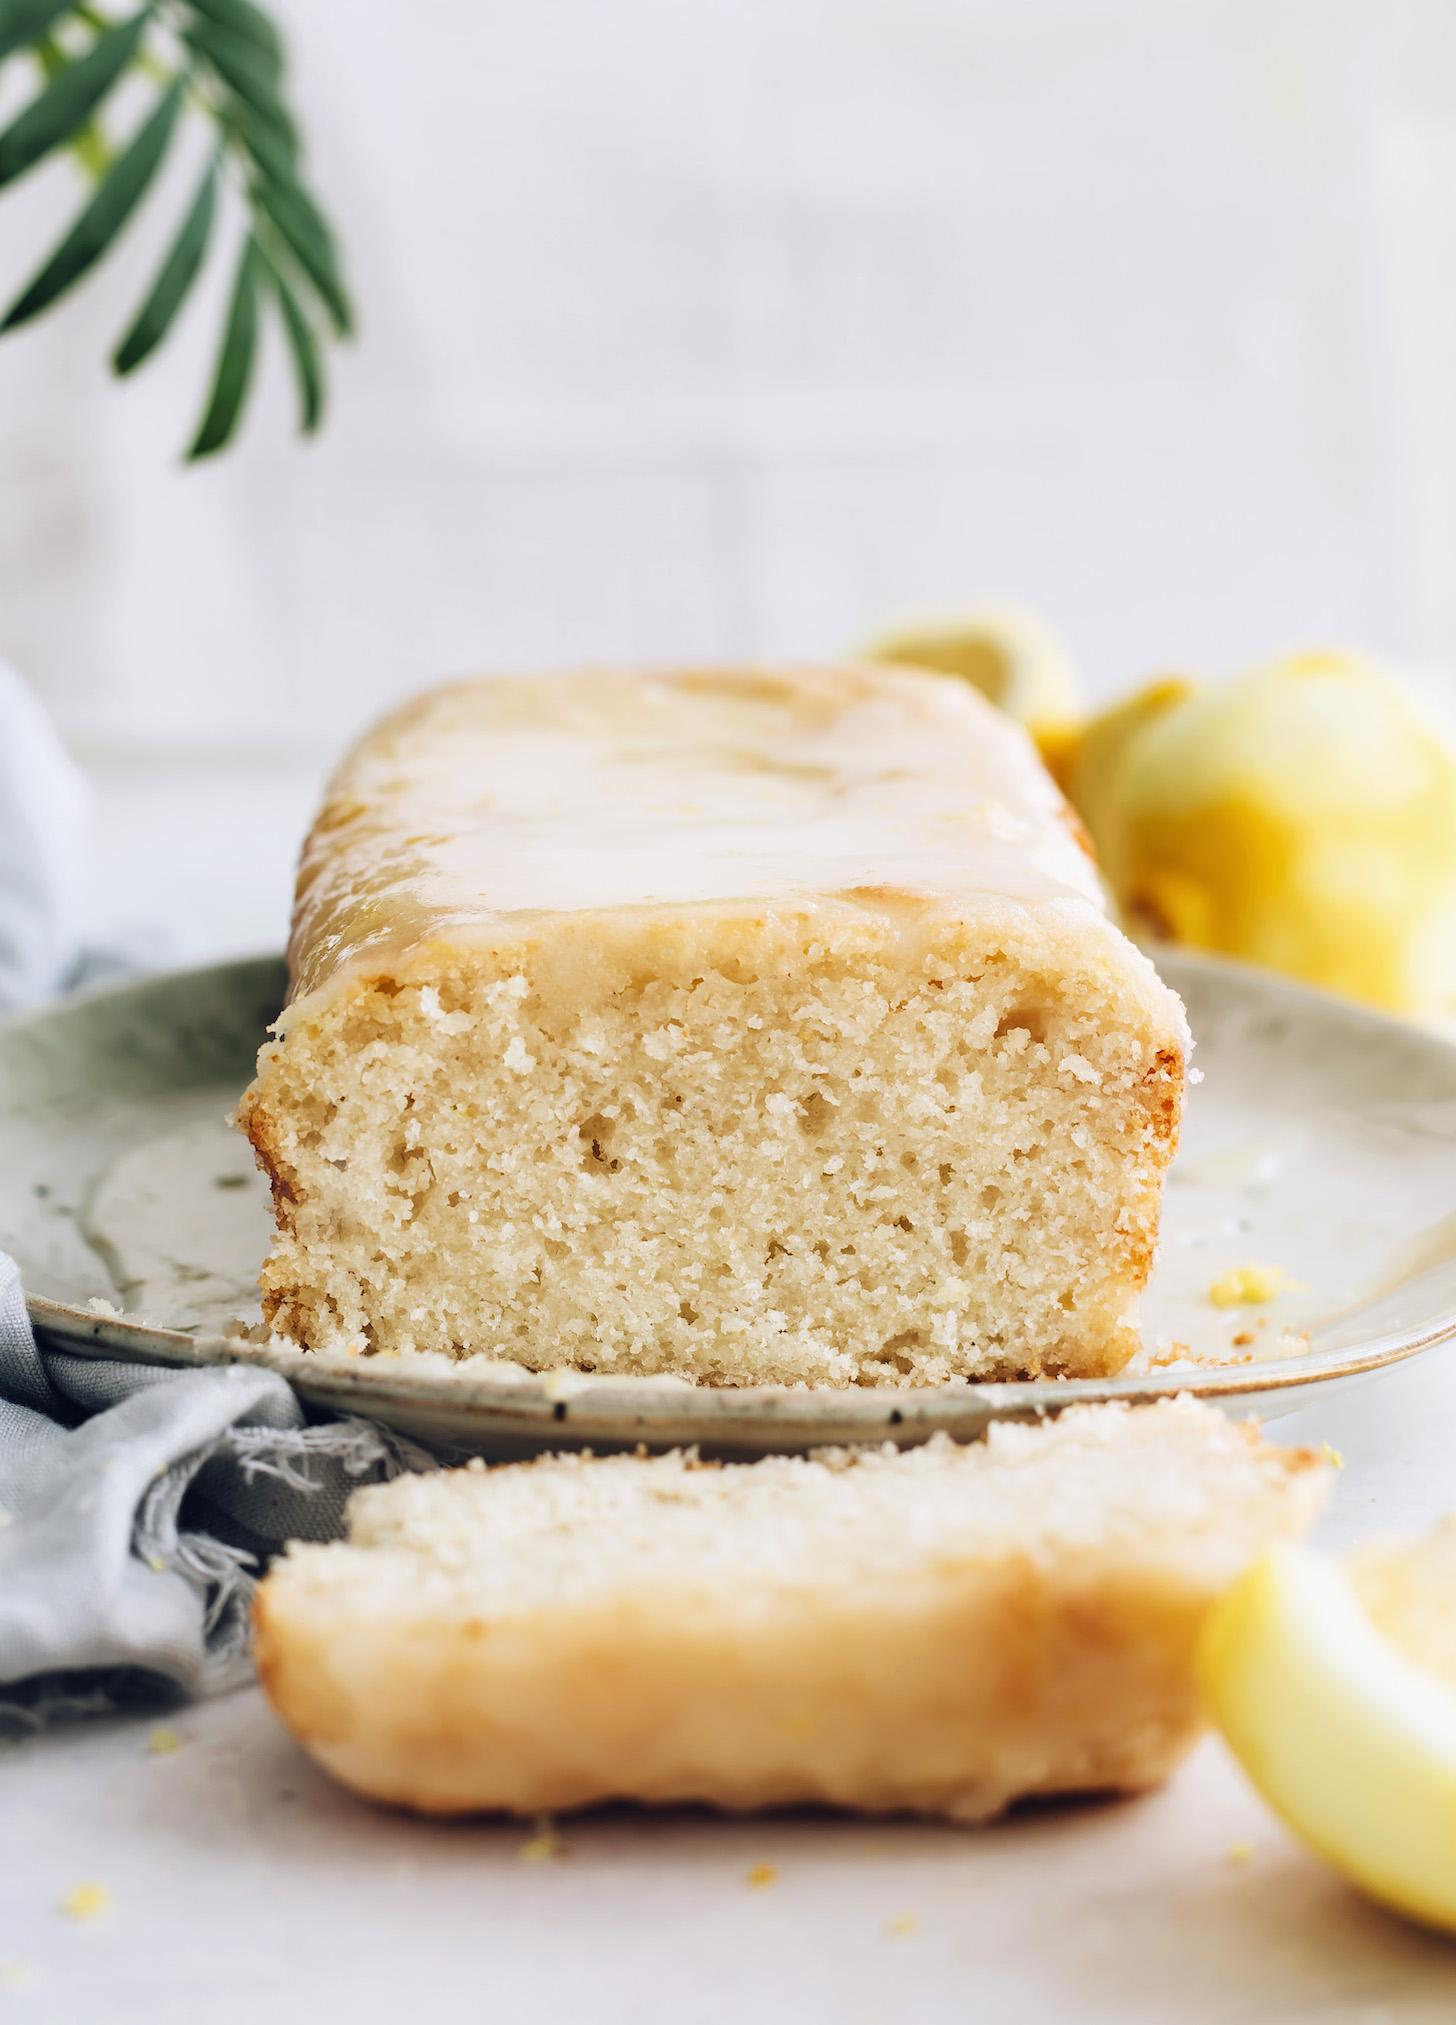 Partially sliced loaf of vegan lemon cake